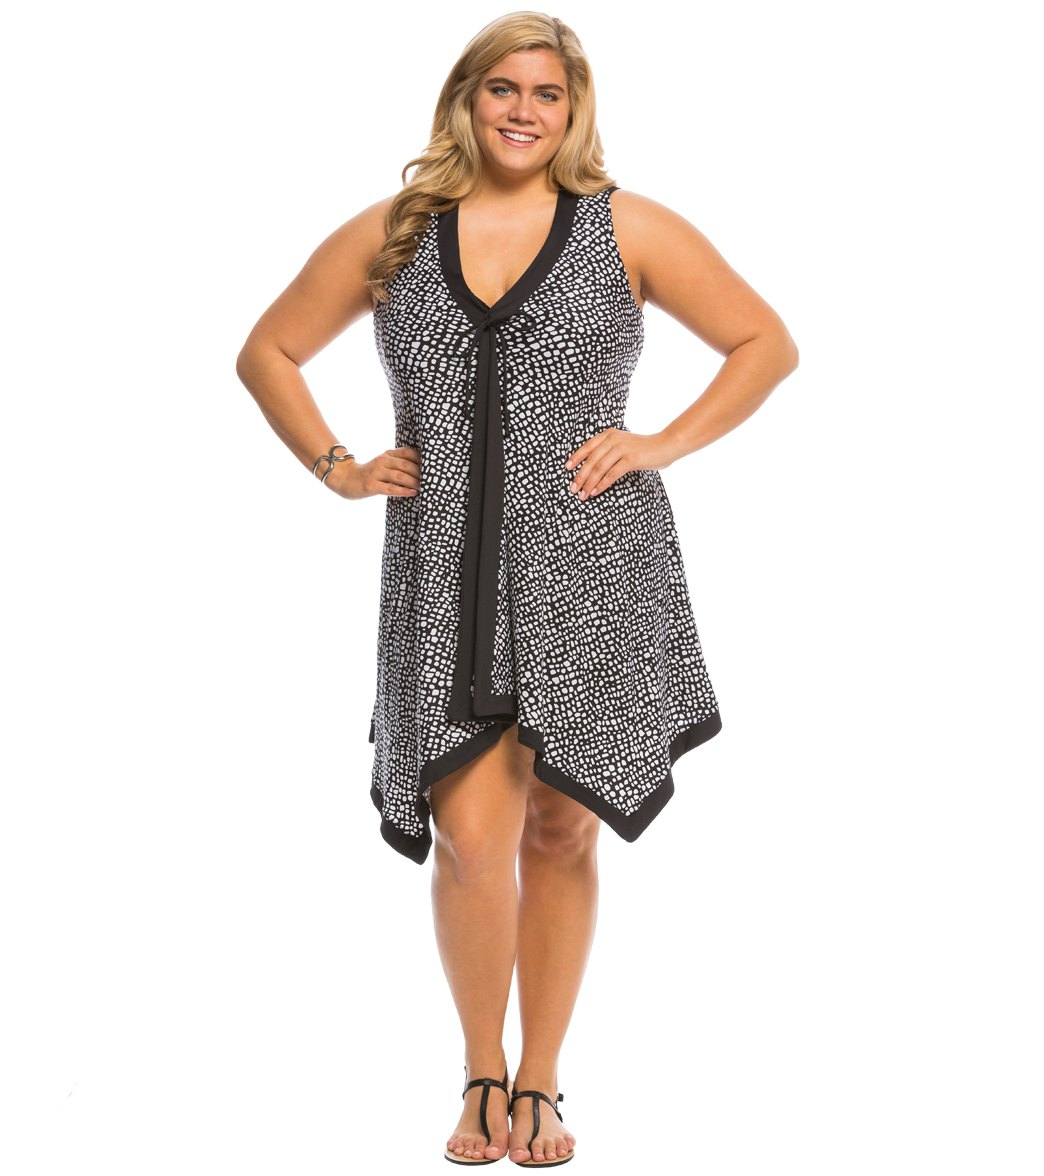 plus size swim cover up dress choice image - dresses design ideas